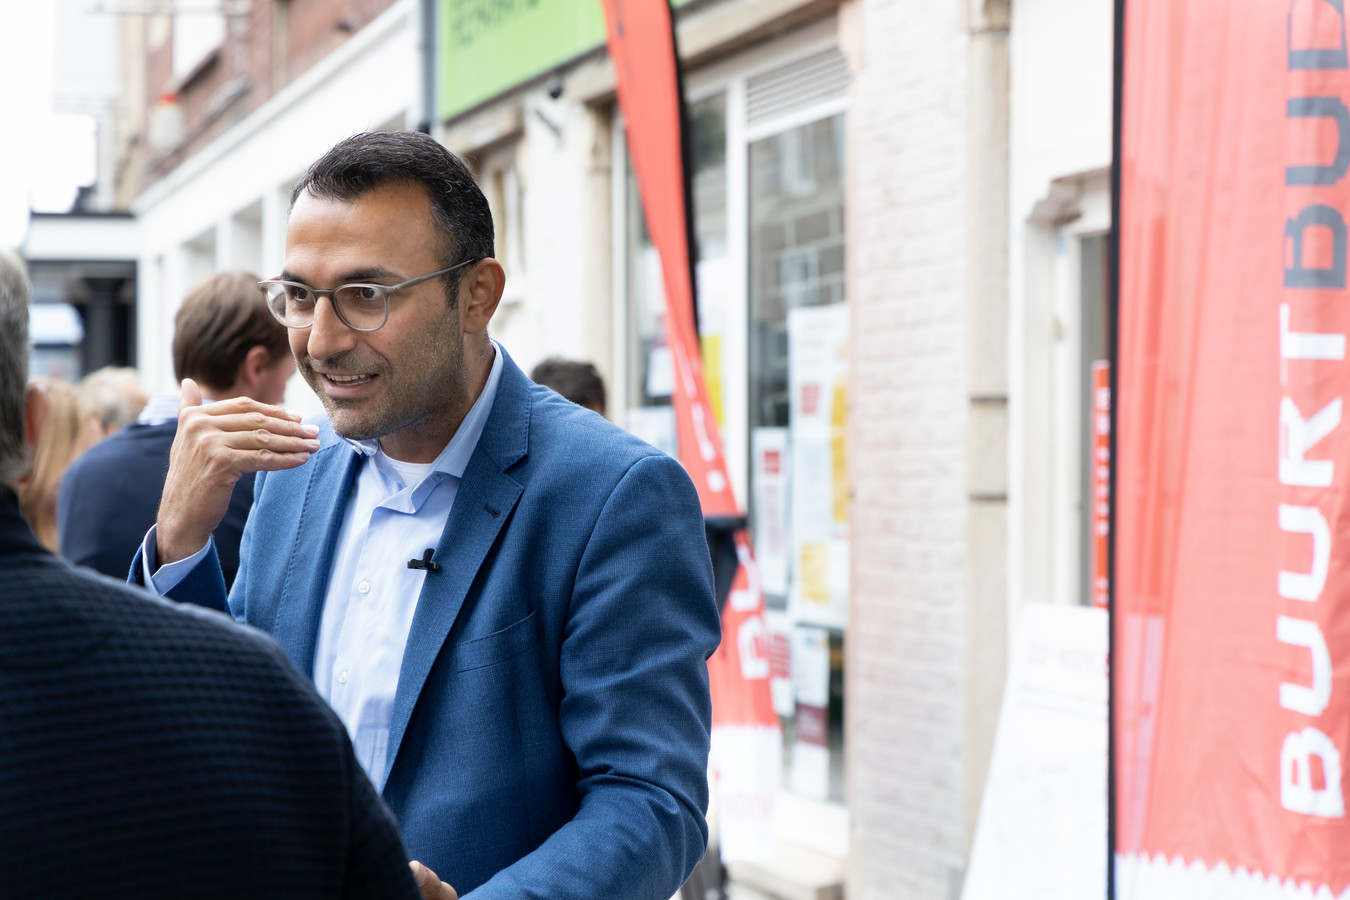 Wethouder Yasin Torunoglu bezoekt de Kruisstraat